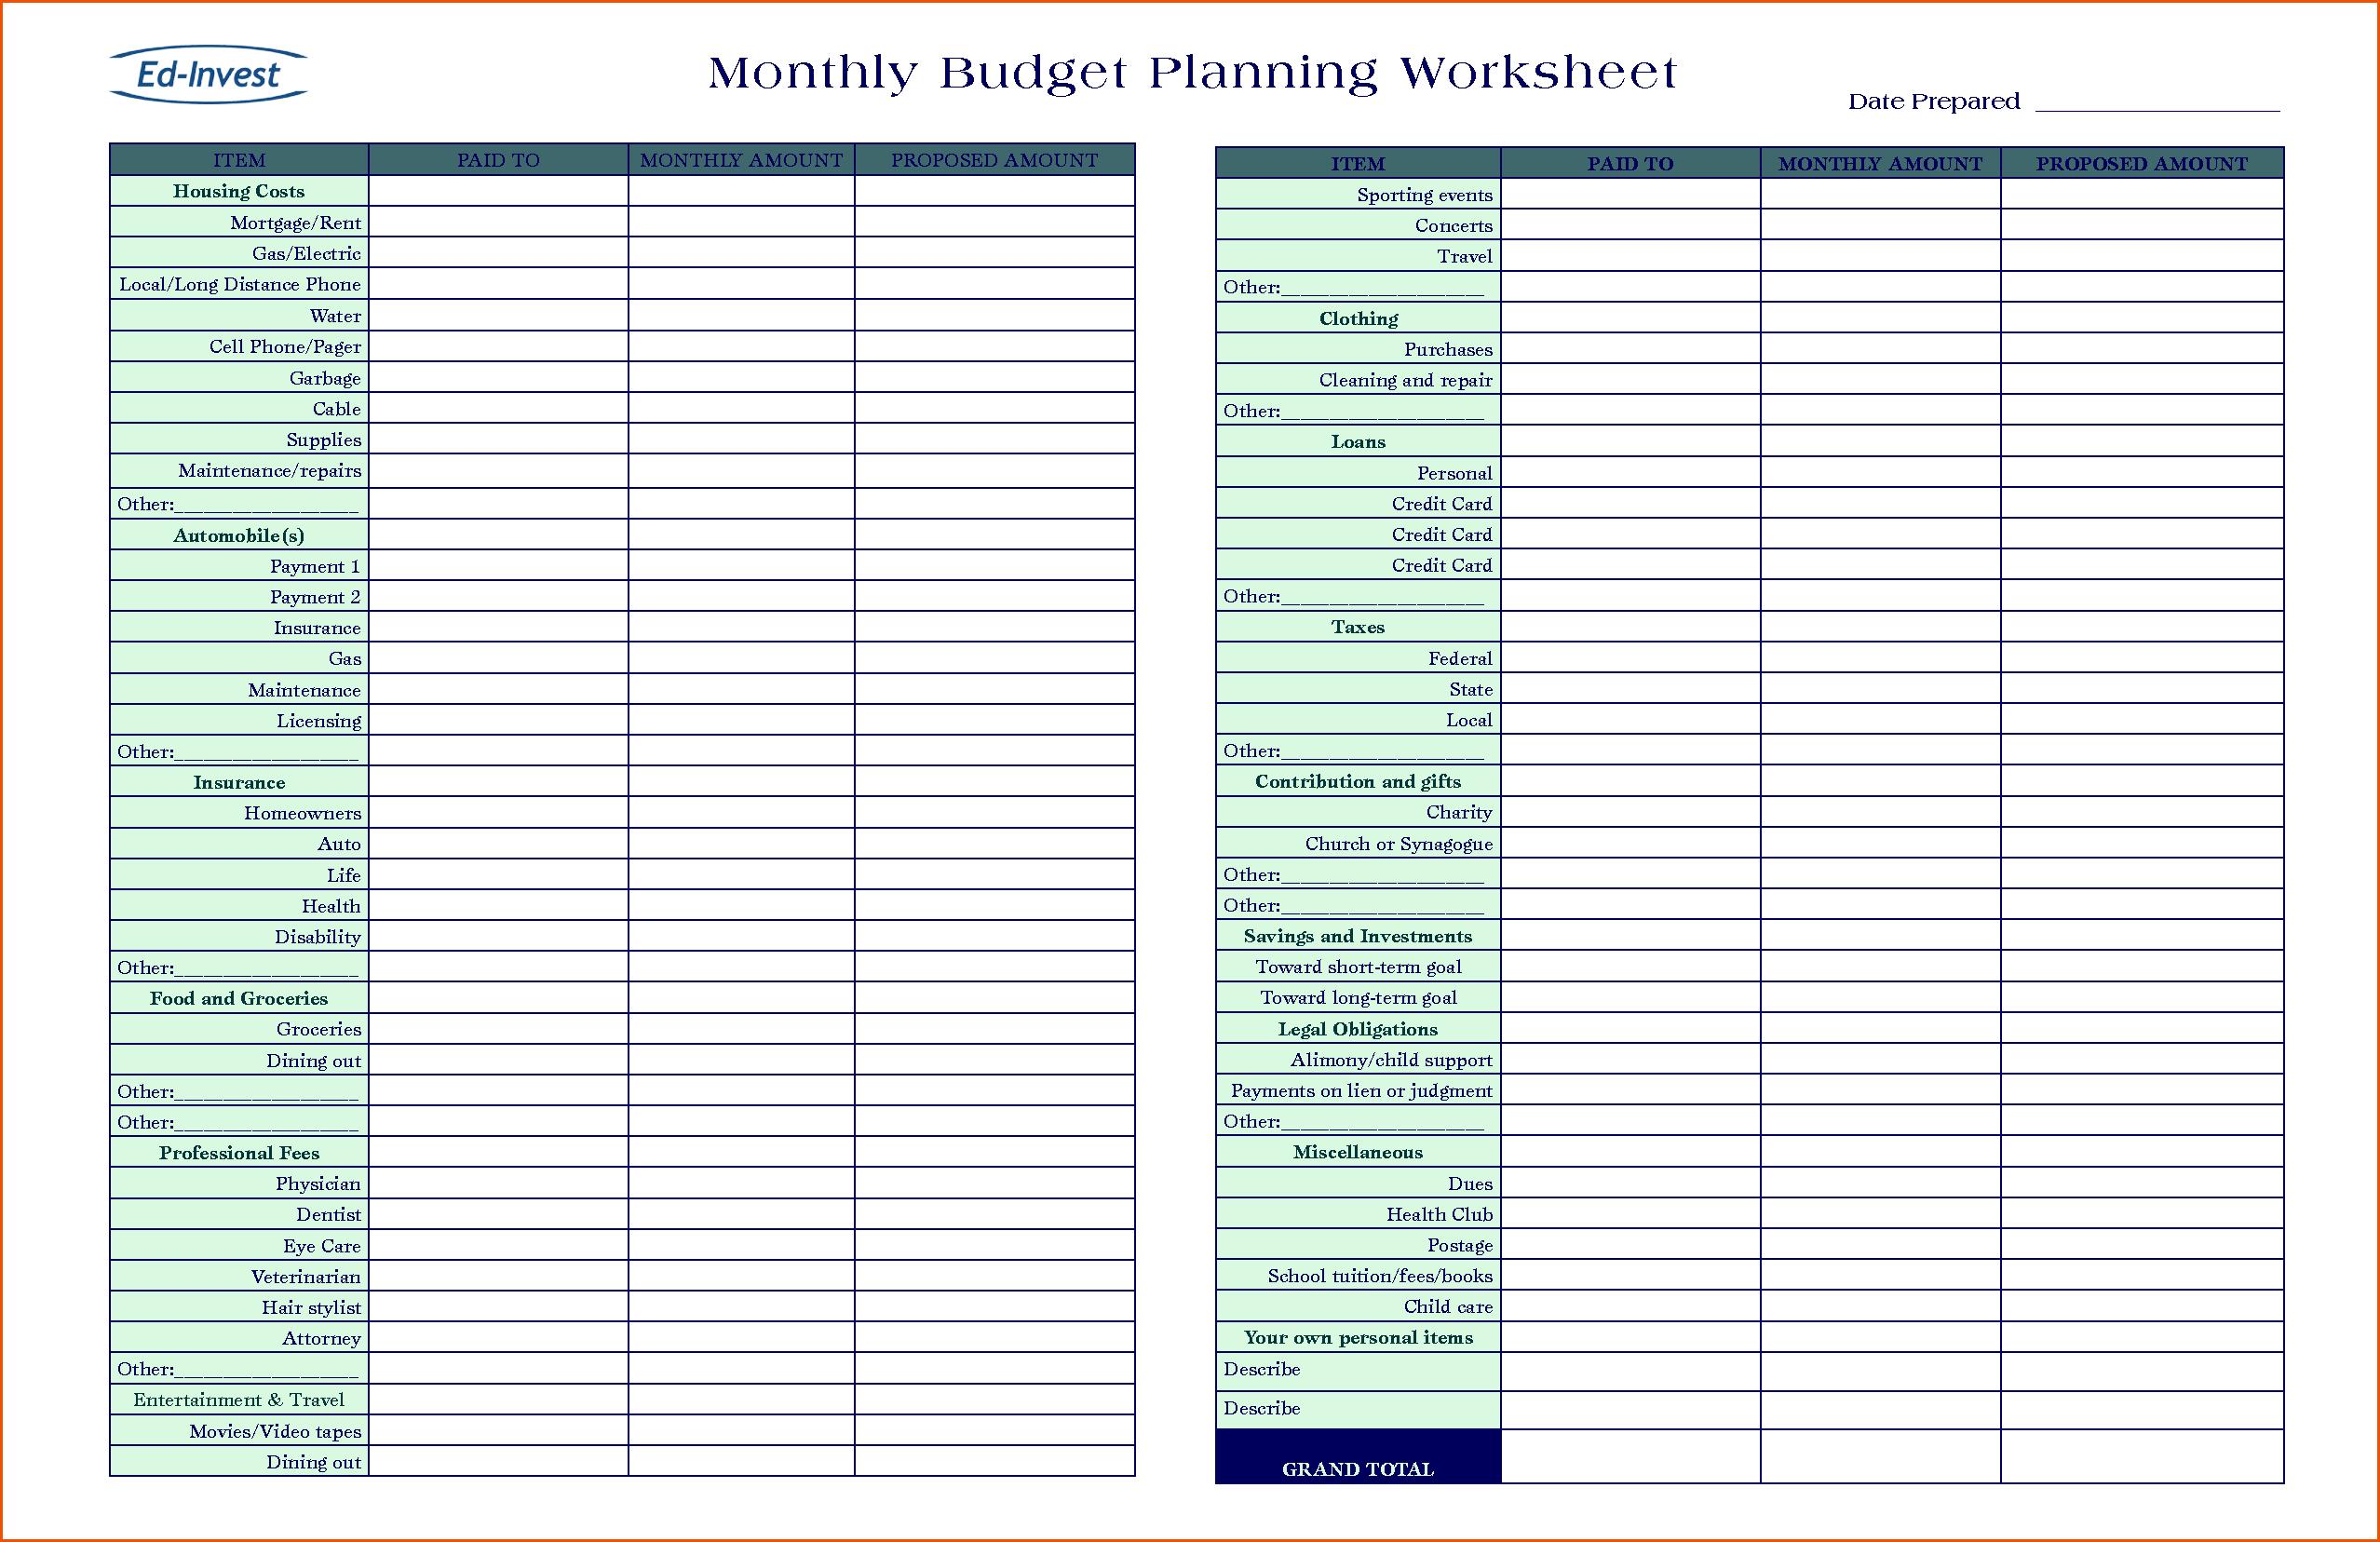 Personal Budget Planner Spreadsheet Regarding Budget Planning Spreadsheet Invoice Template Business Excel Sheet